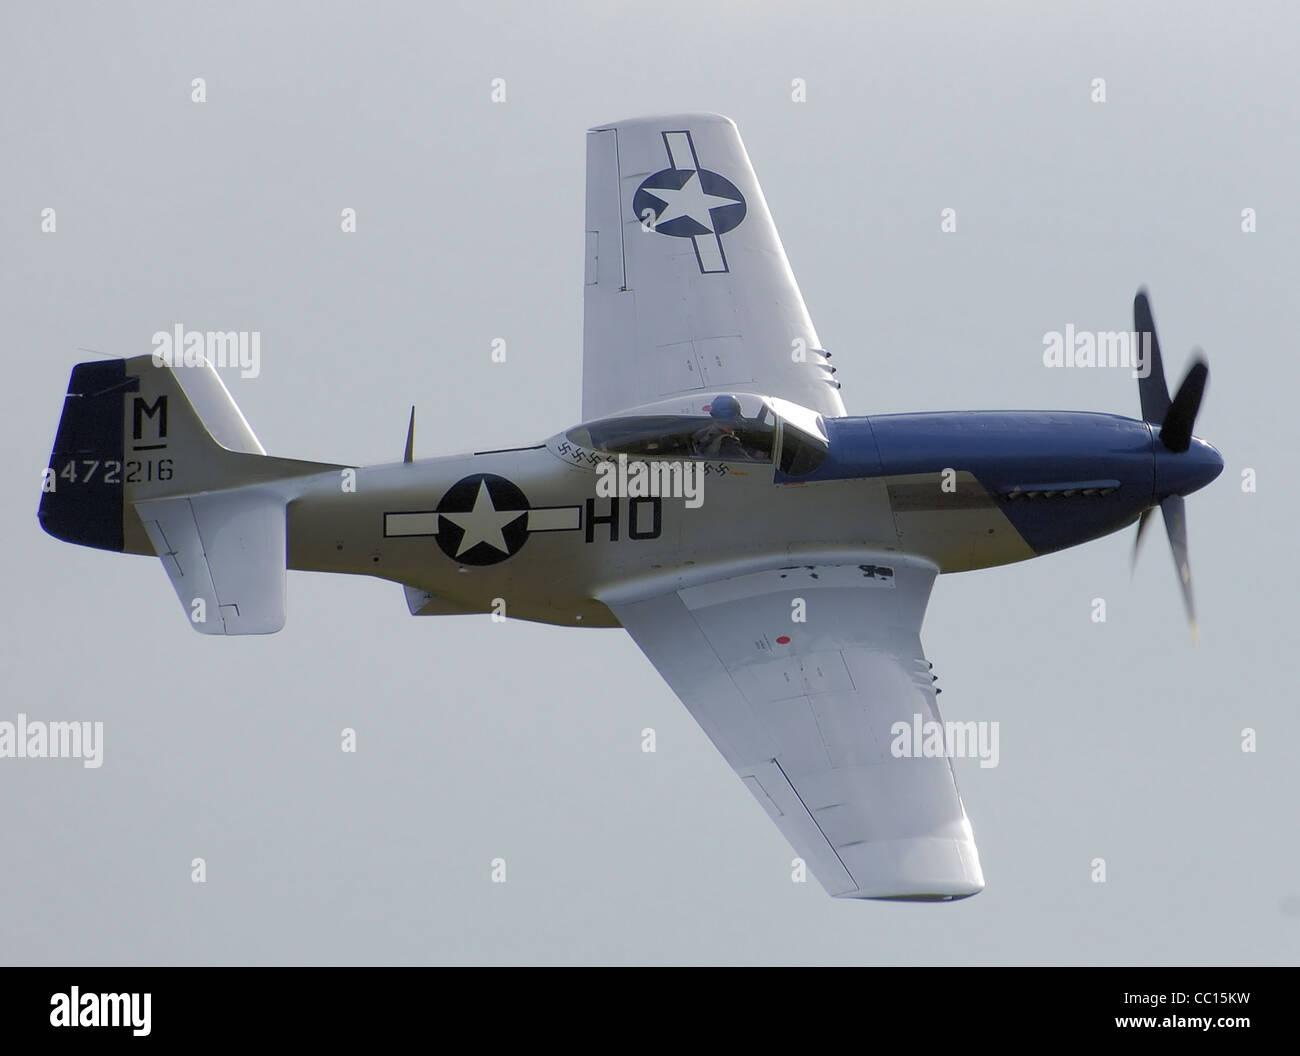 North American P-51D-20 (472216/HO-M, G-BIXL, Miss Helen) Photo Stock